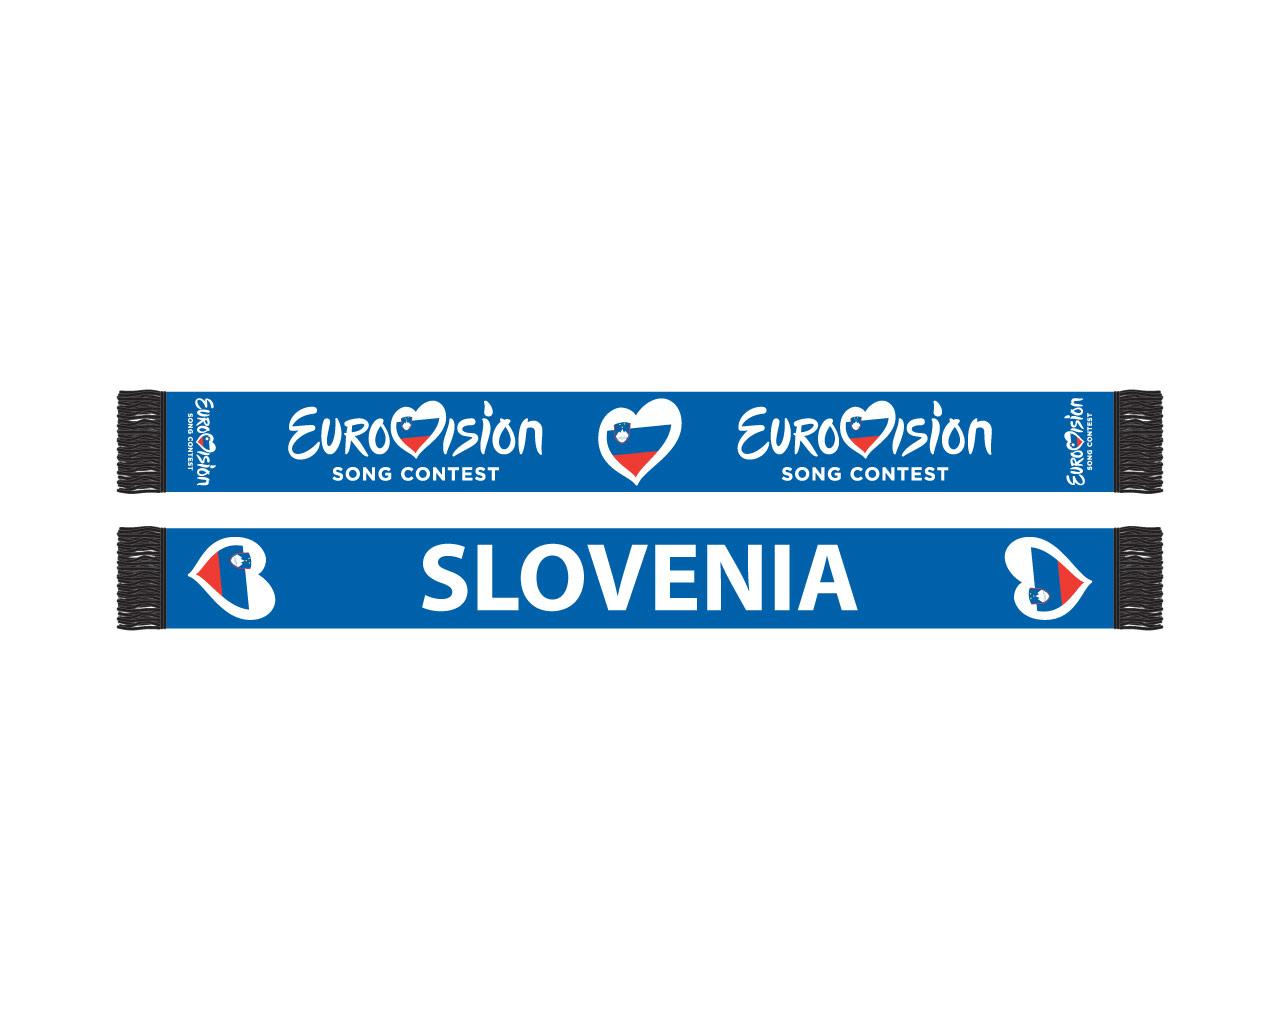 Scarf Slovenia